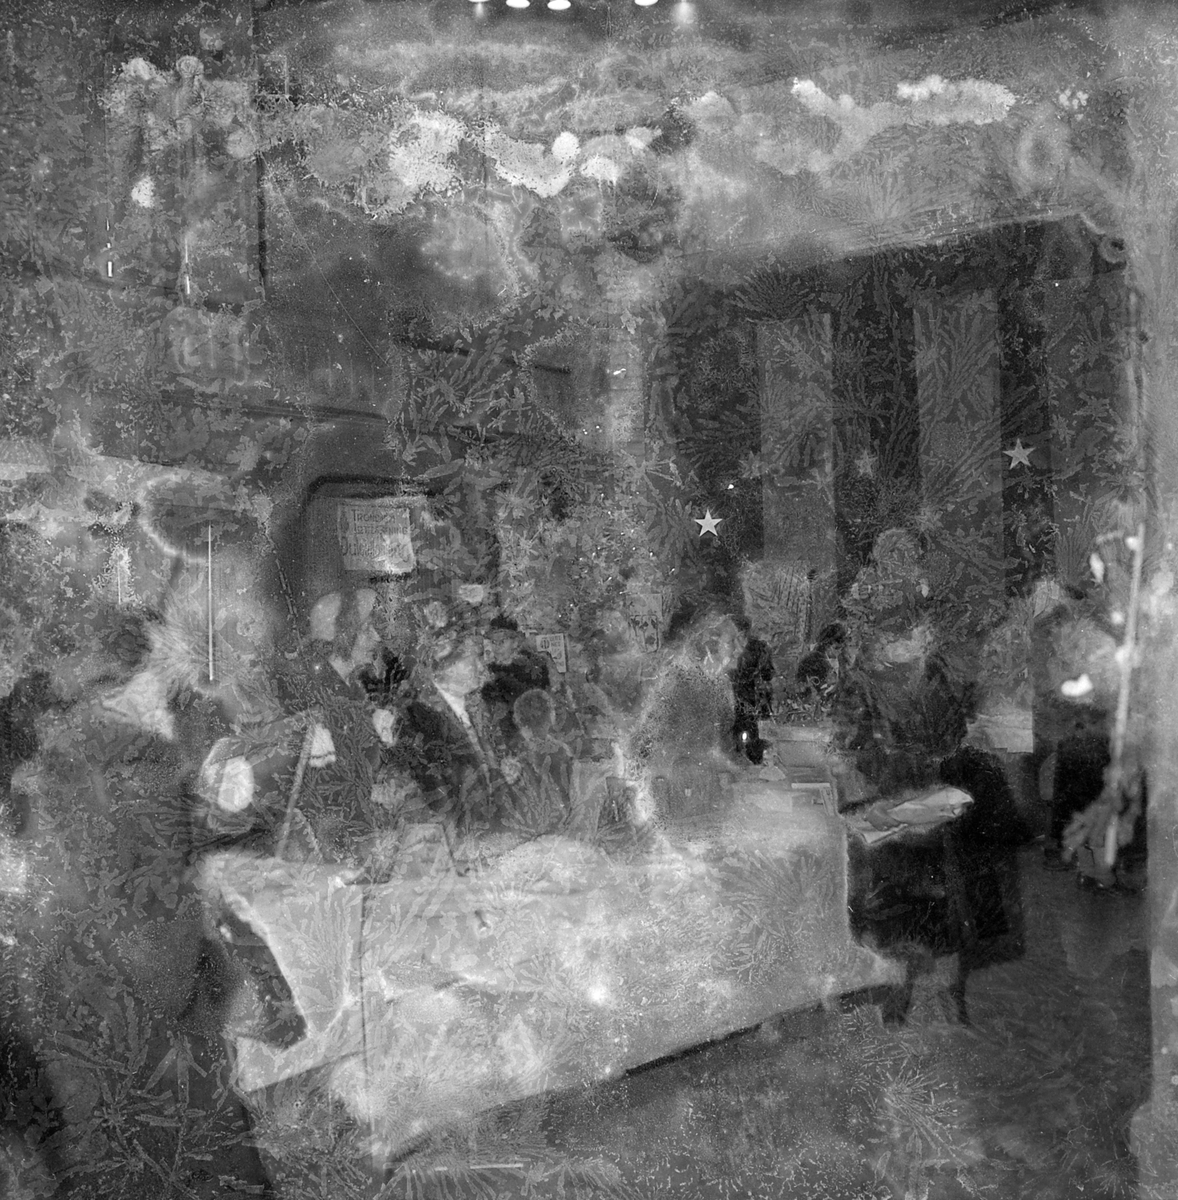 Julemessen 1952